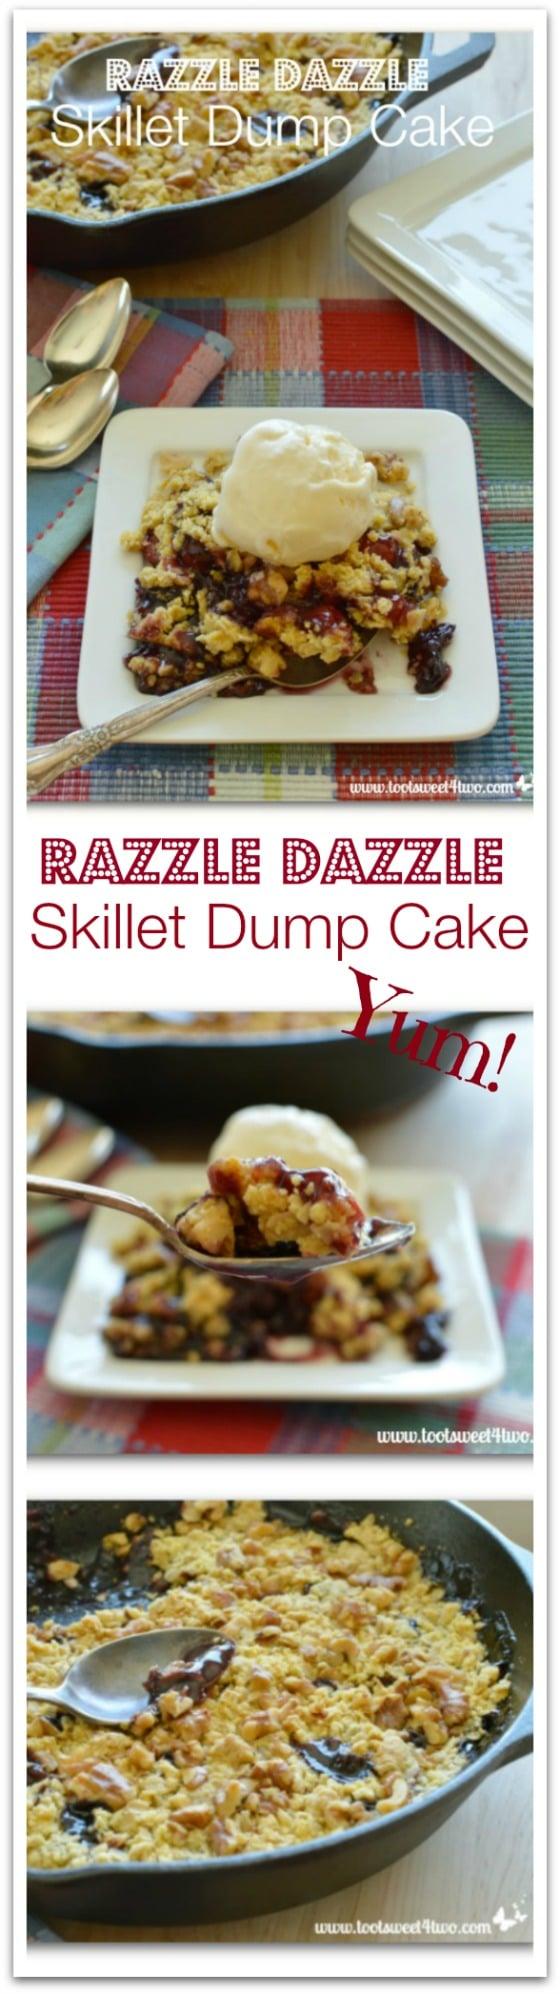 Razzle Dazzle Skillet Dump Cake Pinterest